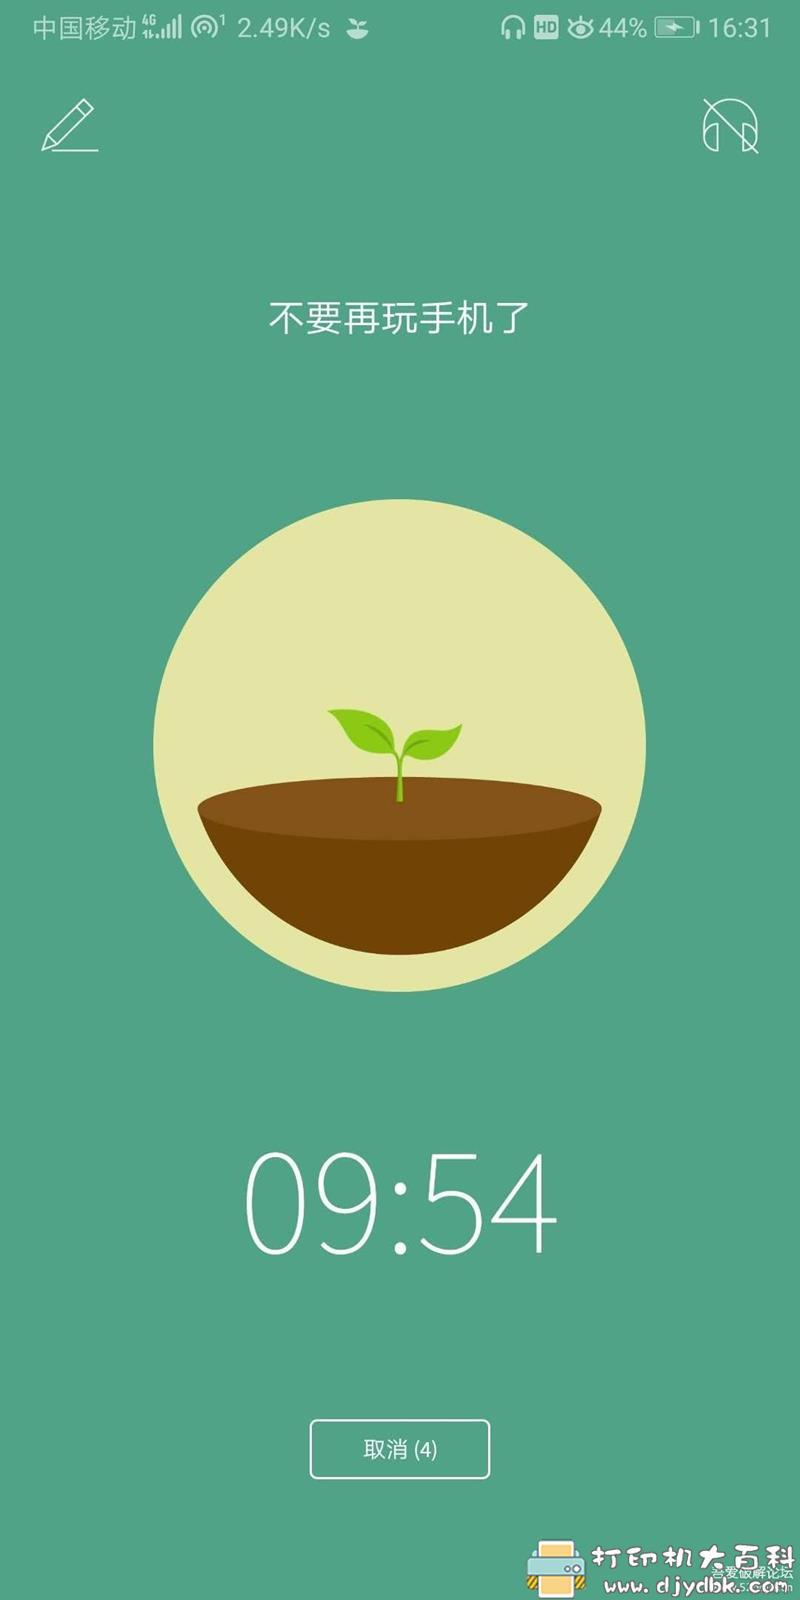 [Android]辅助你放下手机专注工作的app:Forest专注森林 v4.16.1 免费专业版图片 No.1